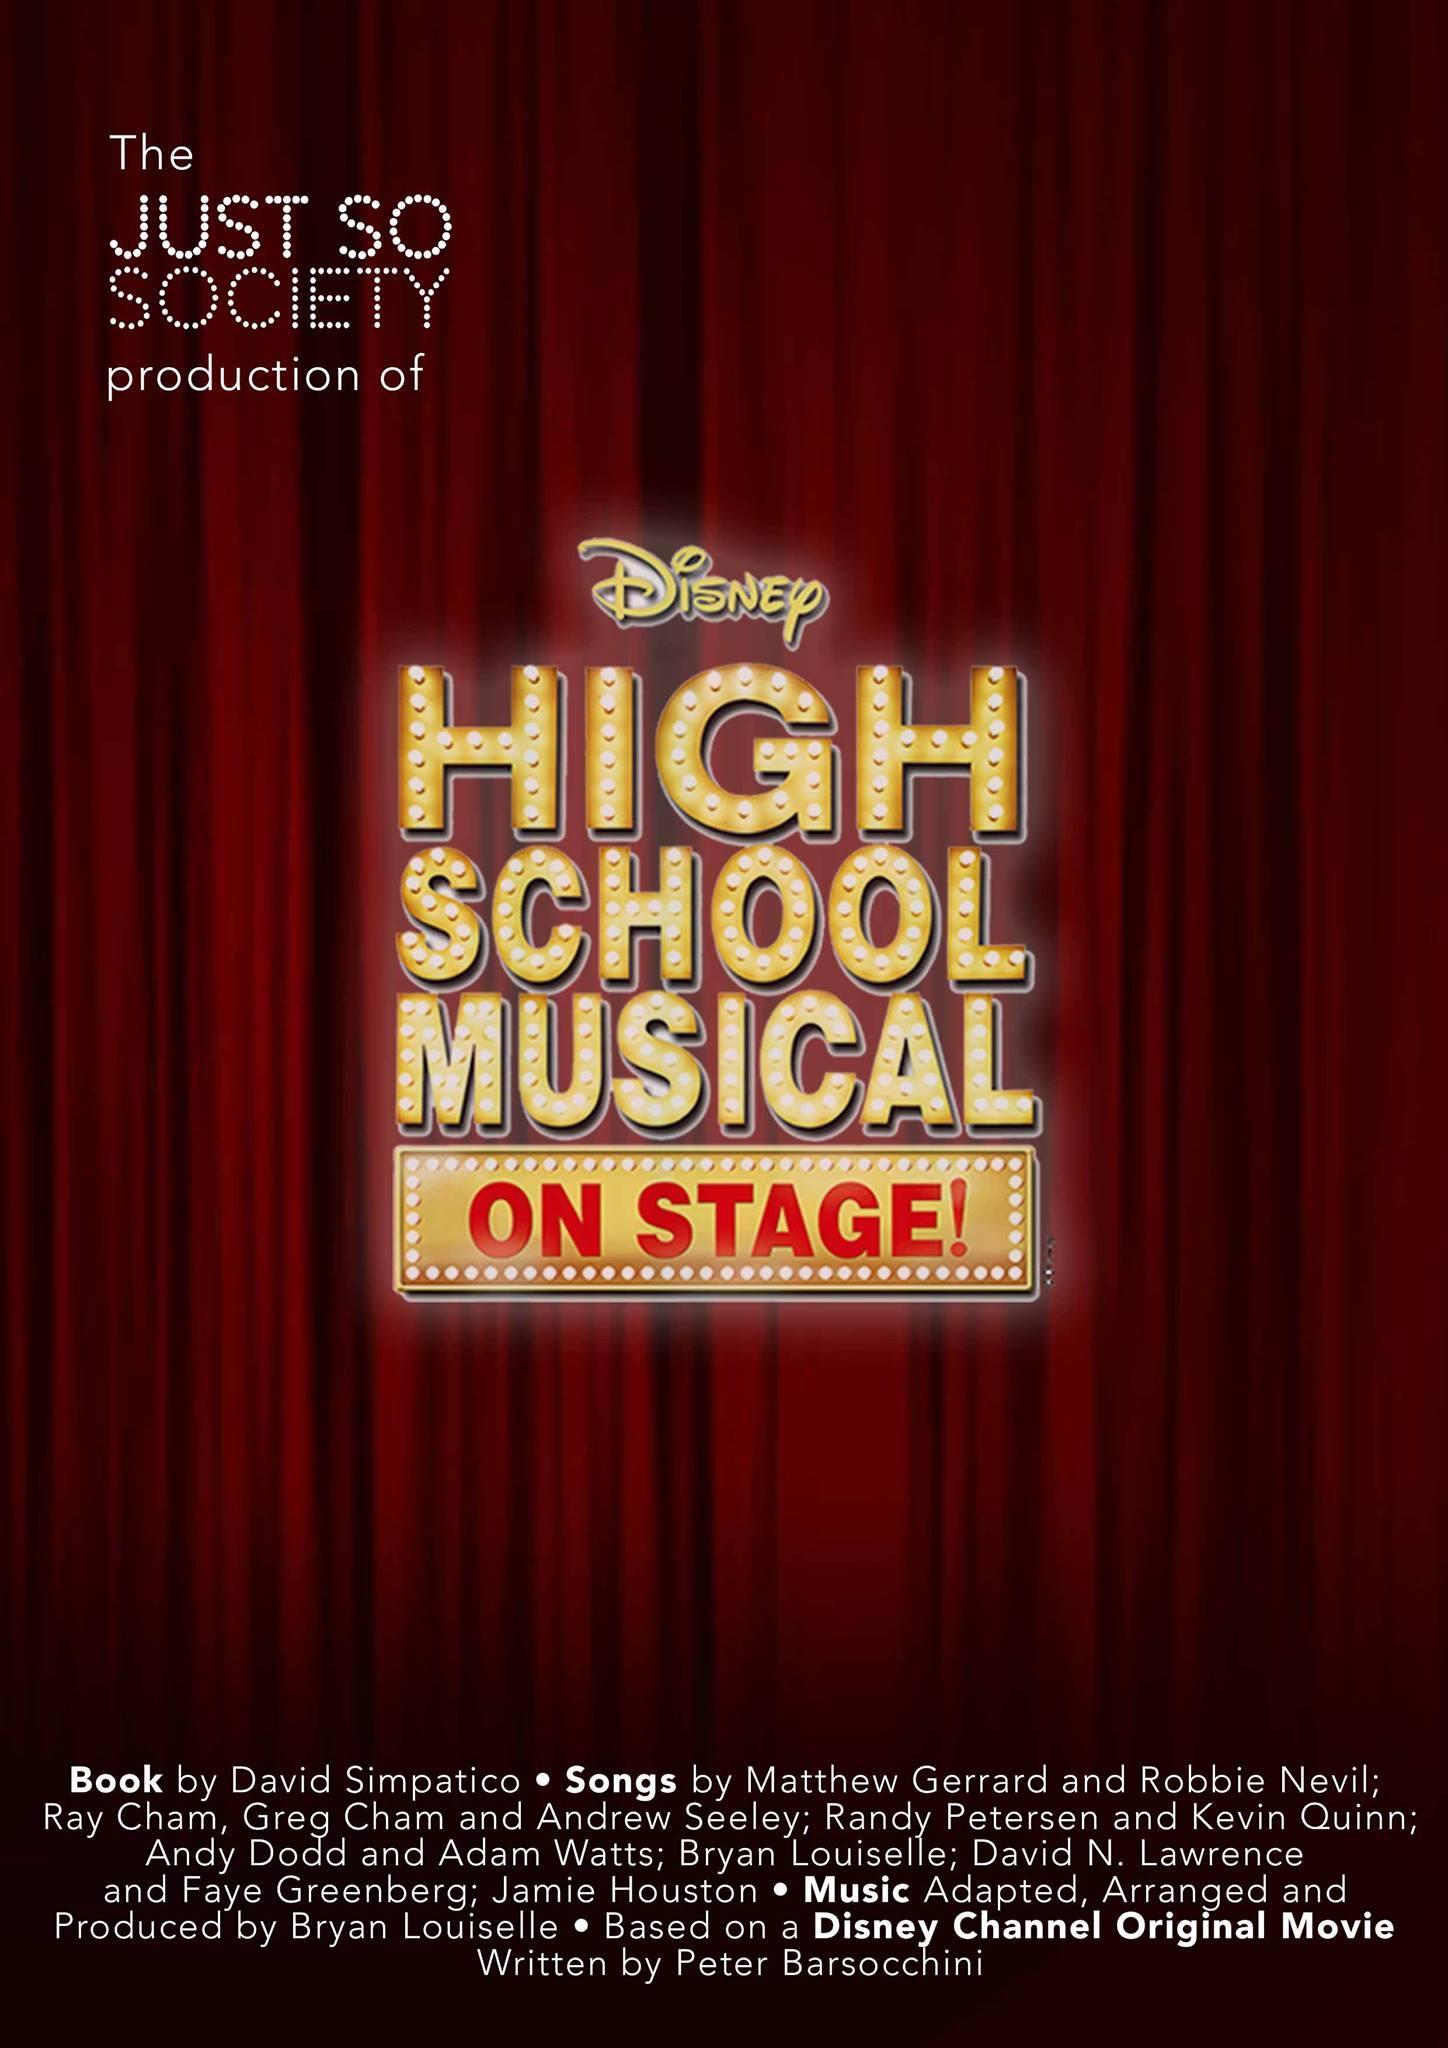 High School Musical: Previewed